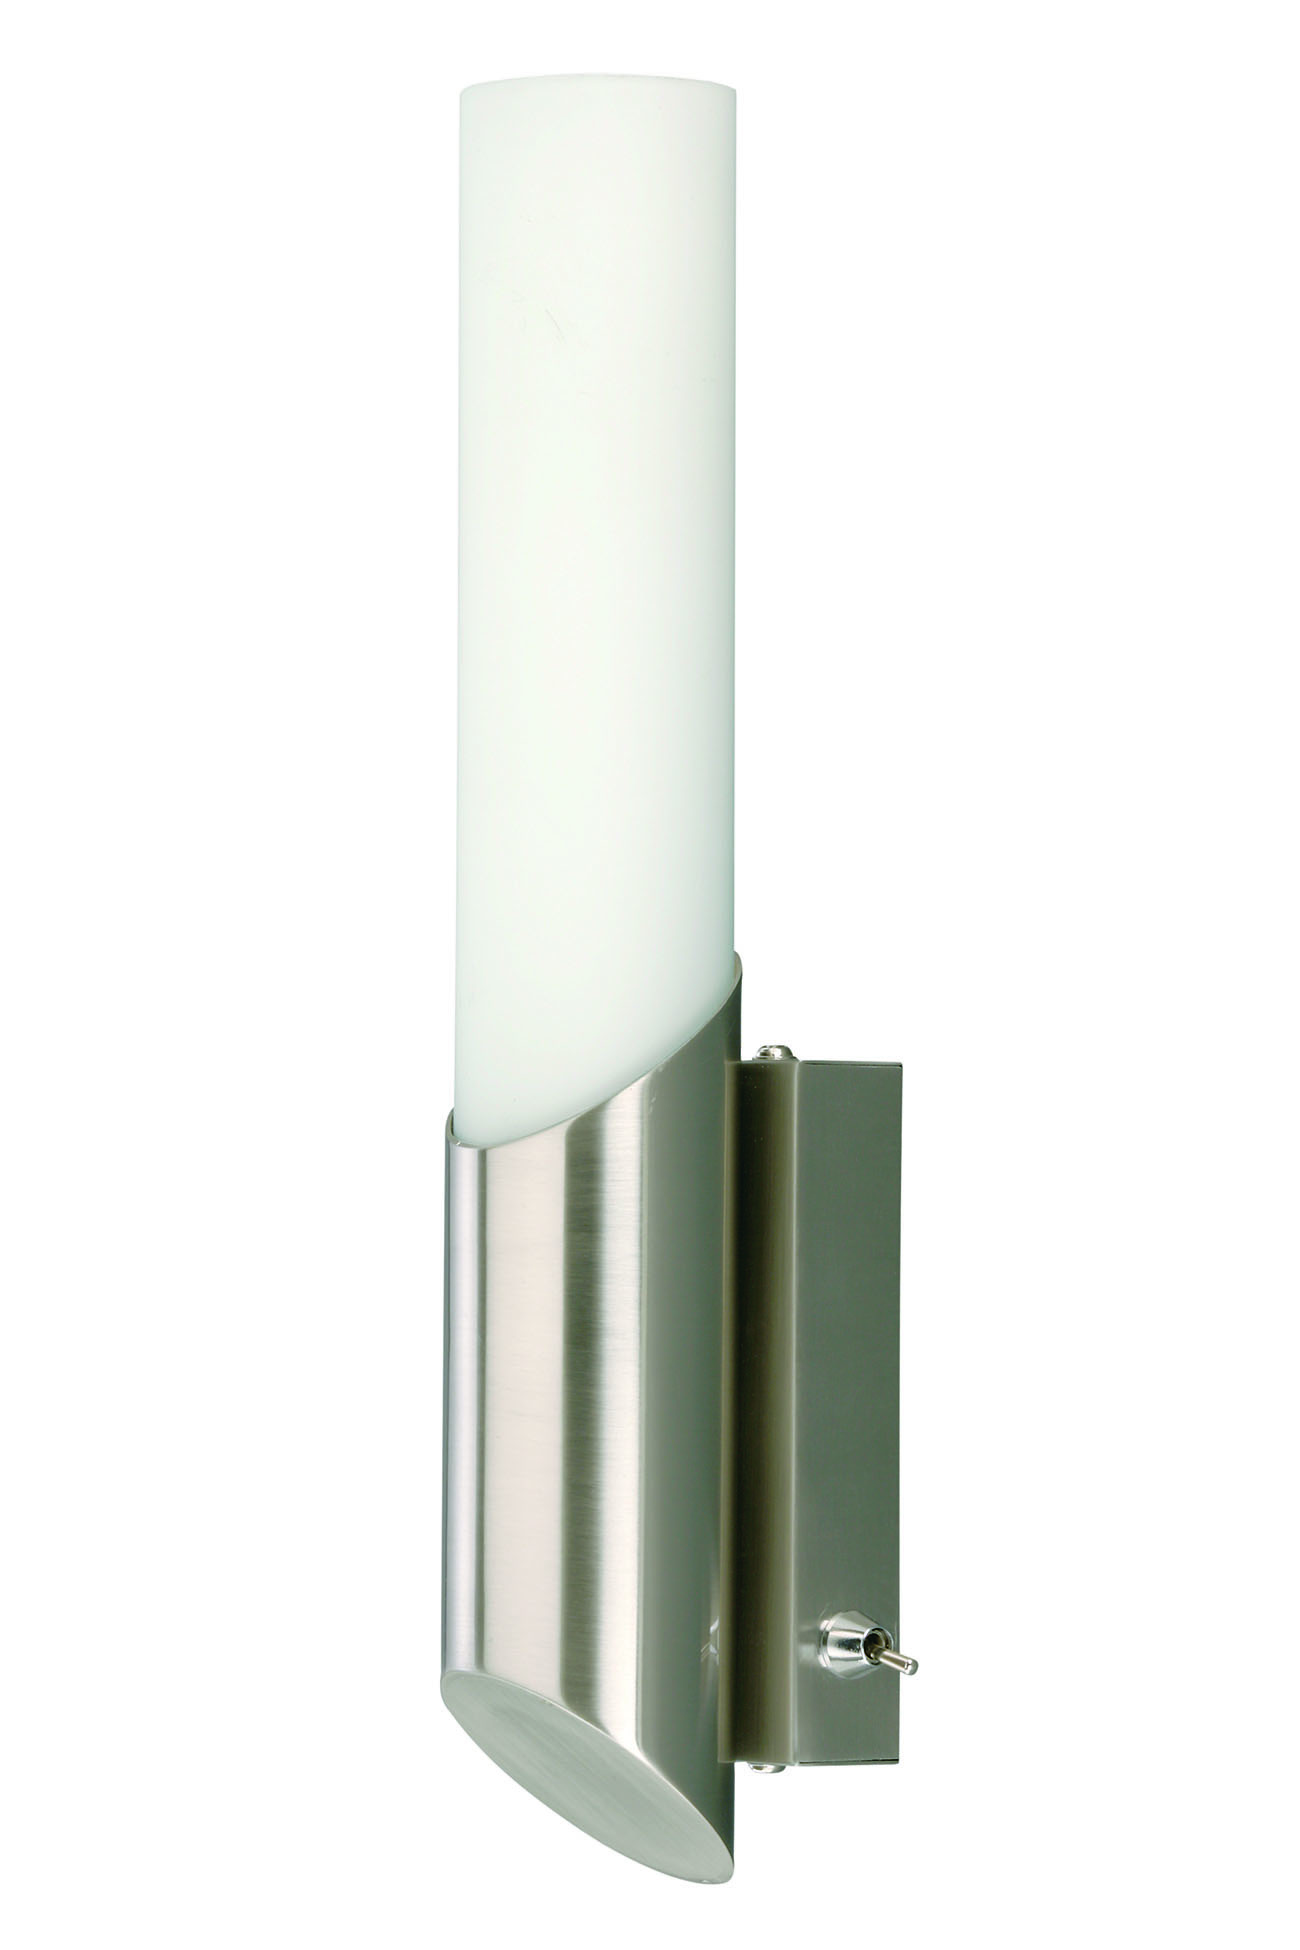 Wandleuchte, 30 cm, max. 40 W, Matt-Nickel